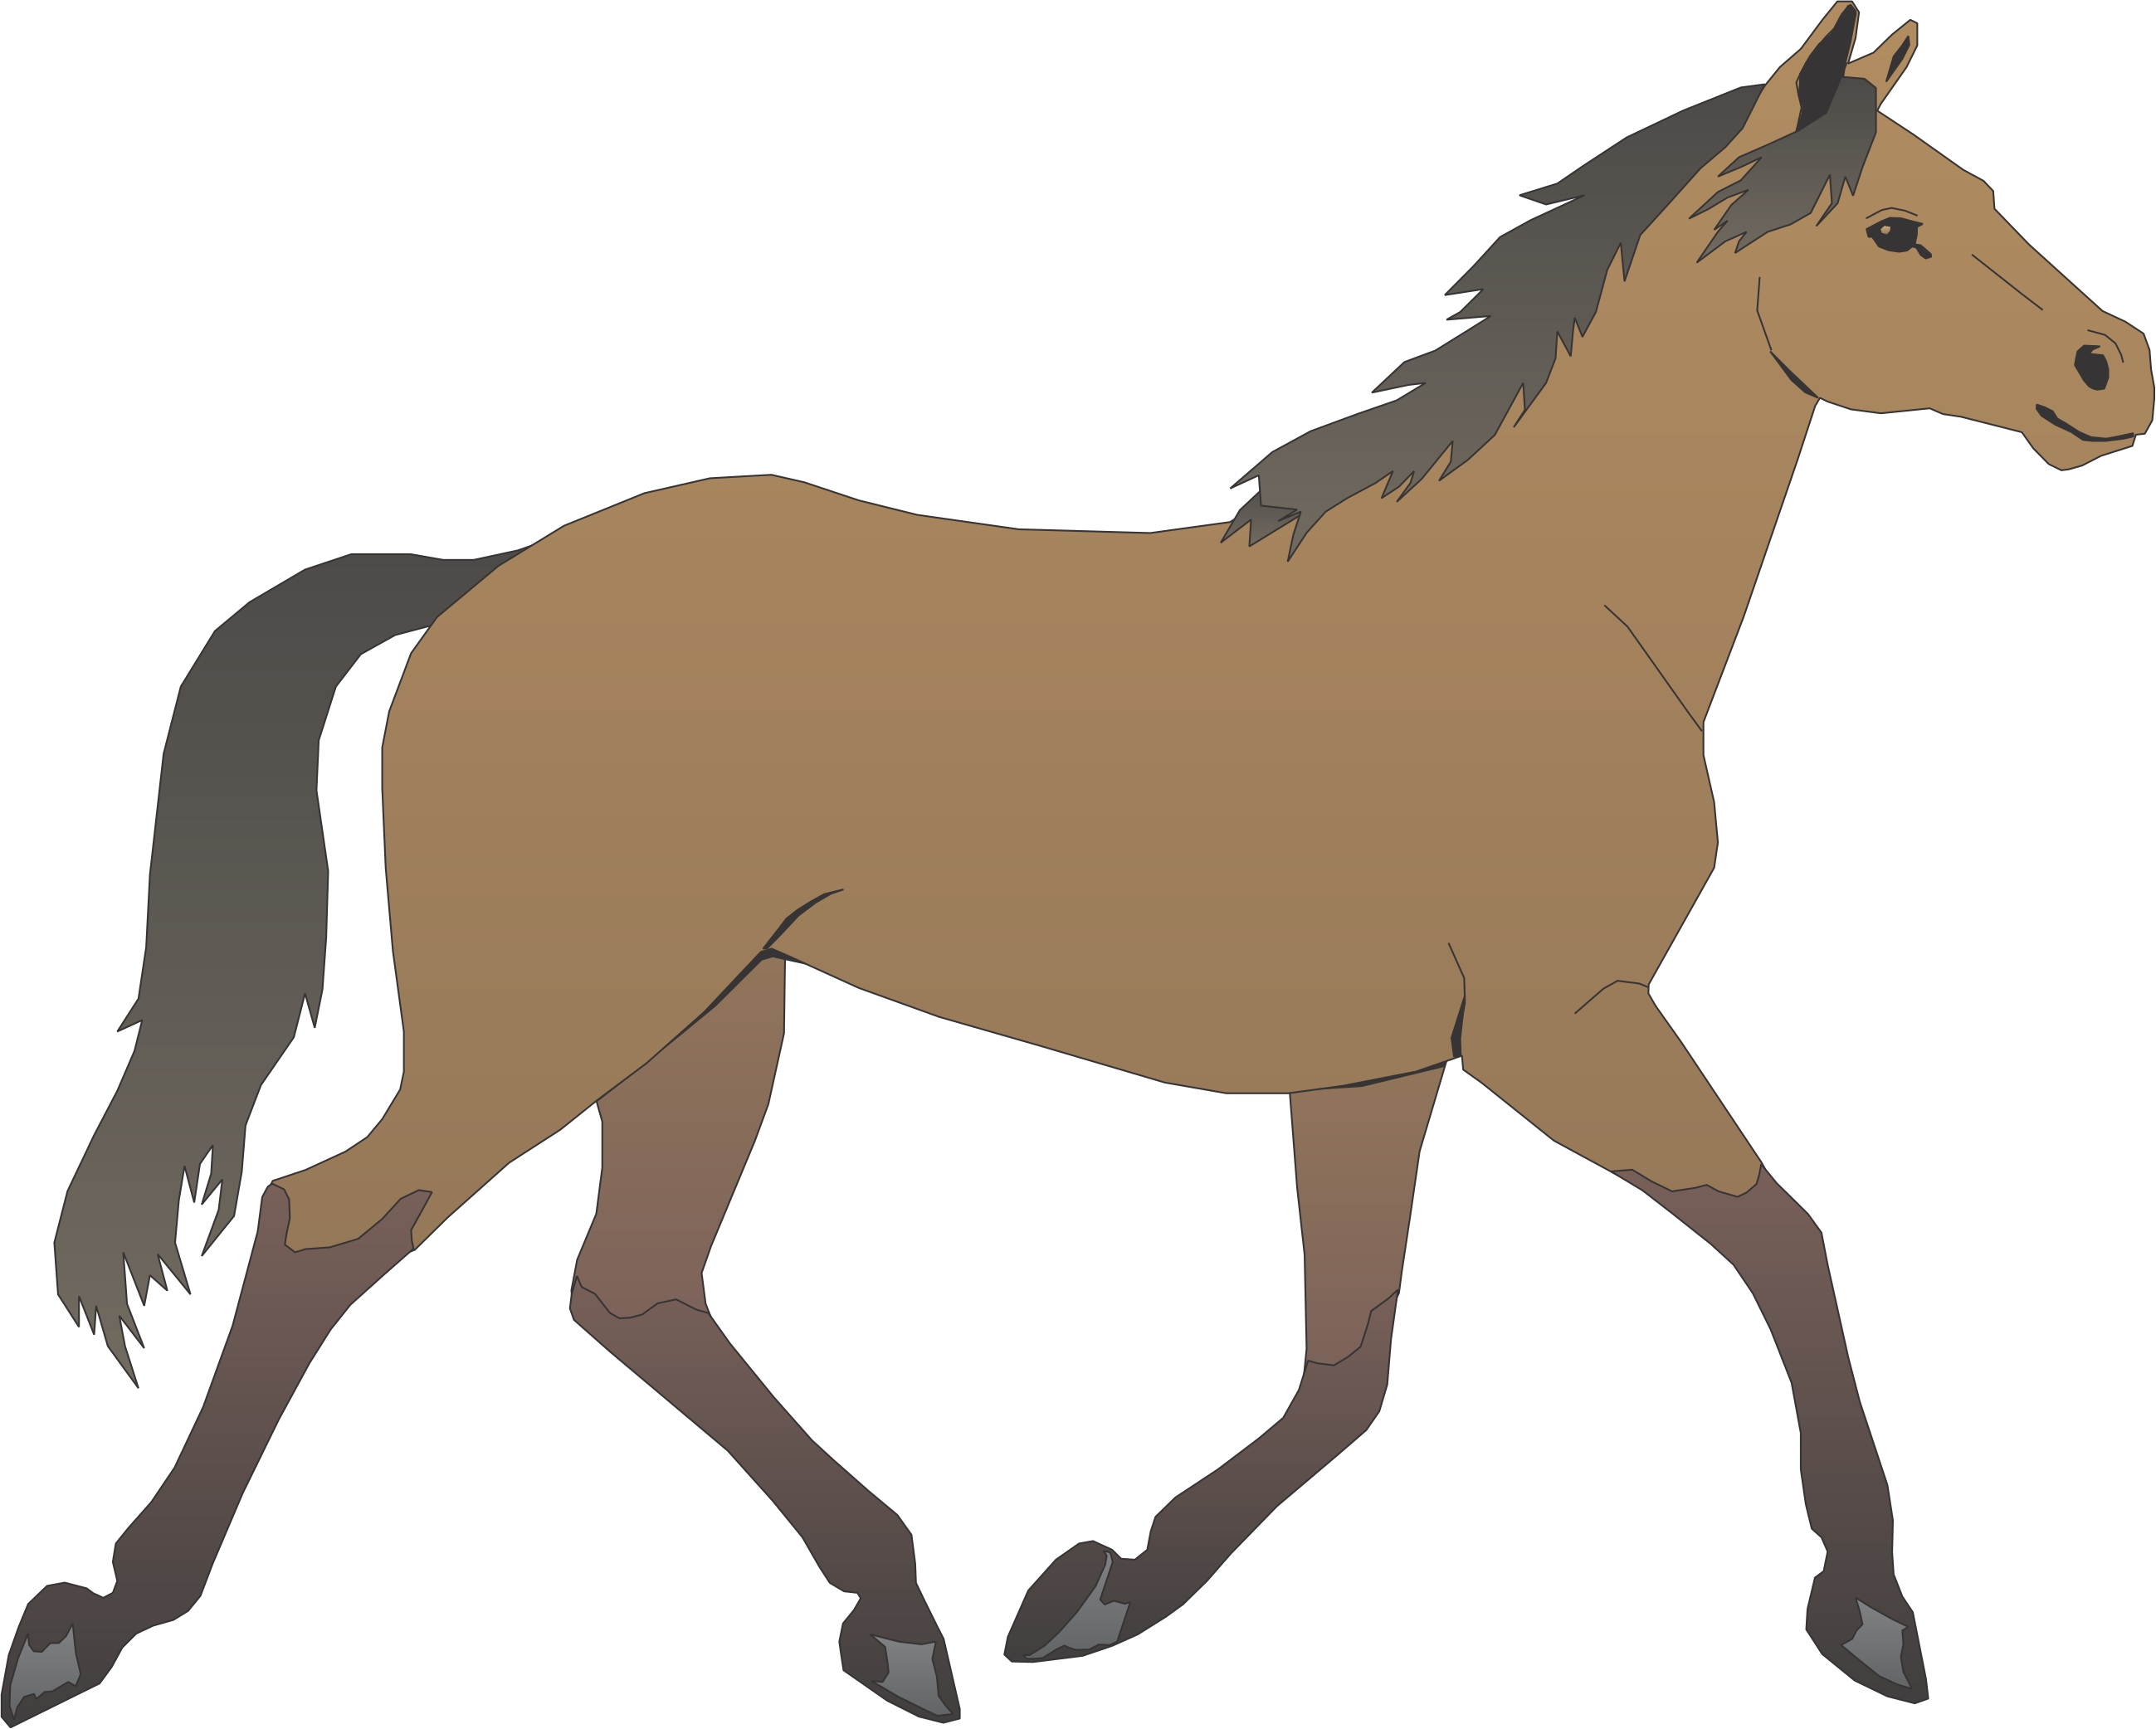 Free Cartoon Horses Images, Download Free Clip Art, Free Clip Art on ... image royalty free stock